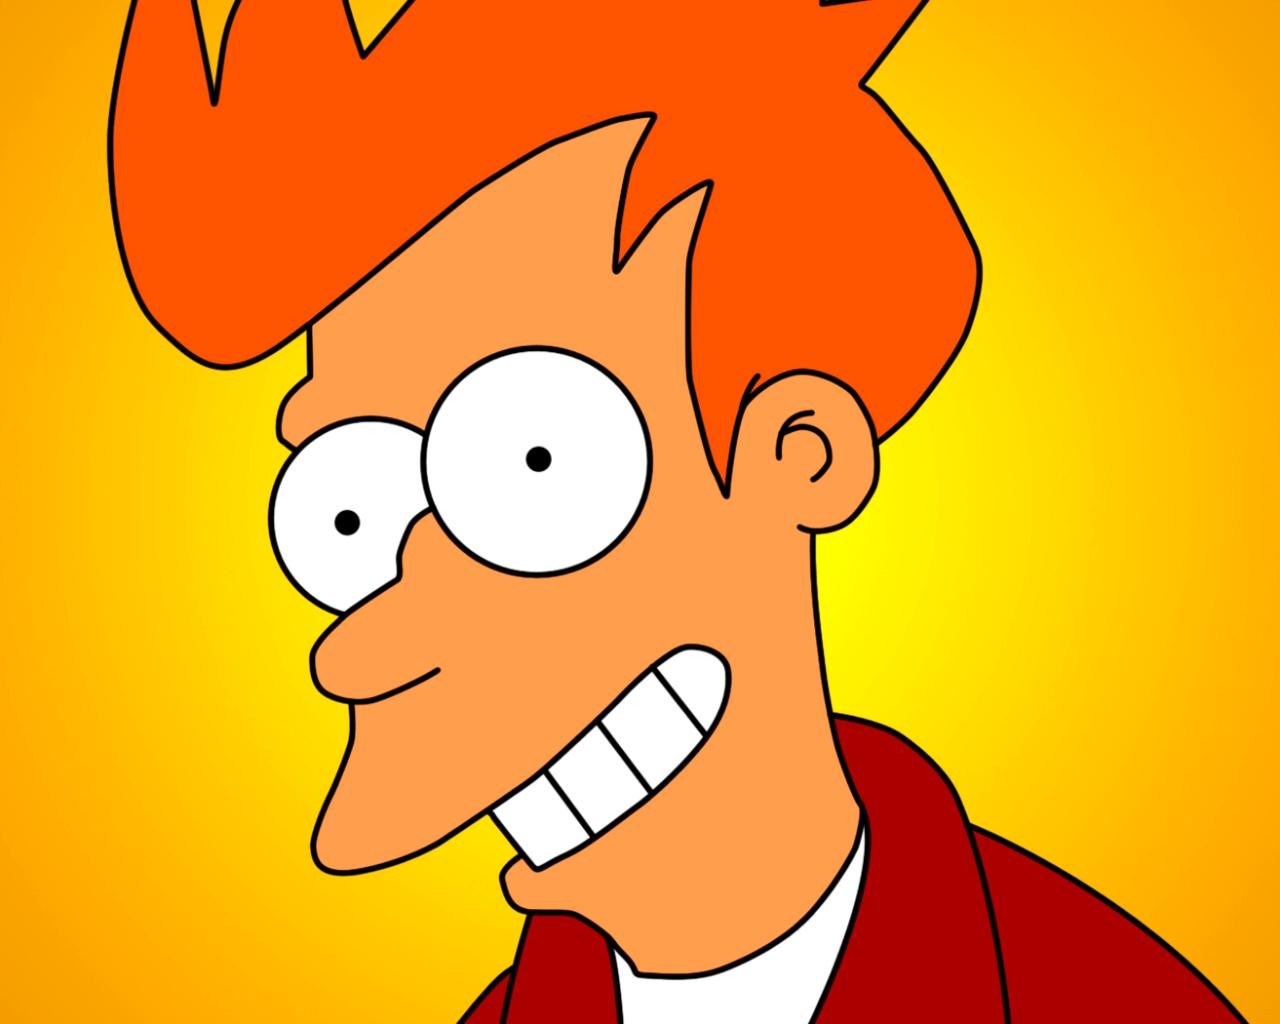 Fry - Futurama Wallpaper (40727819) - Fanpop